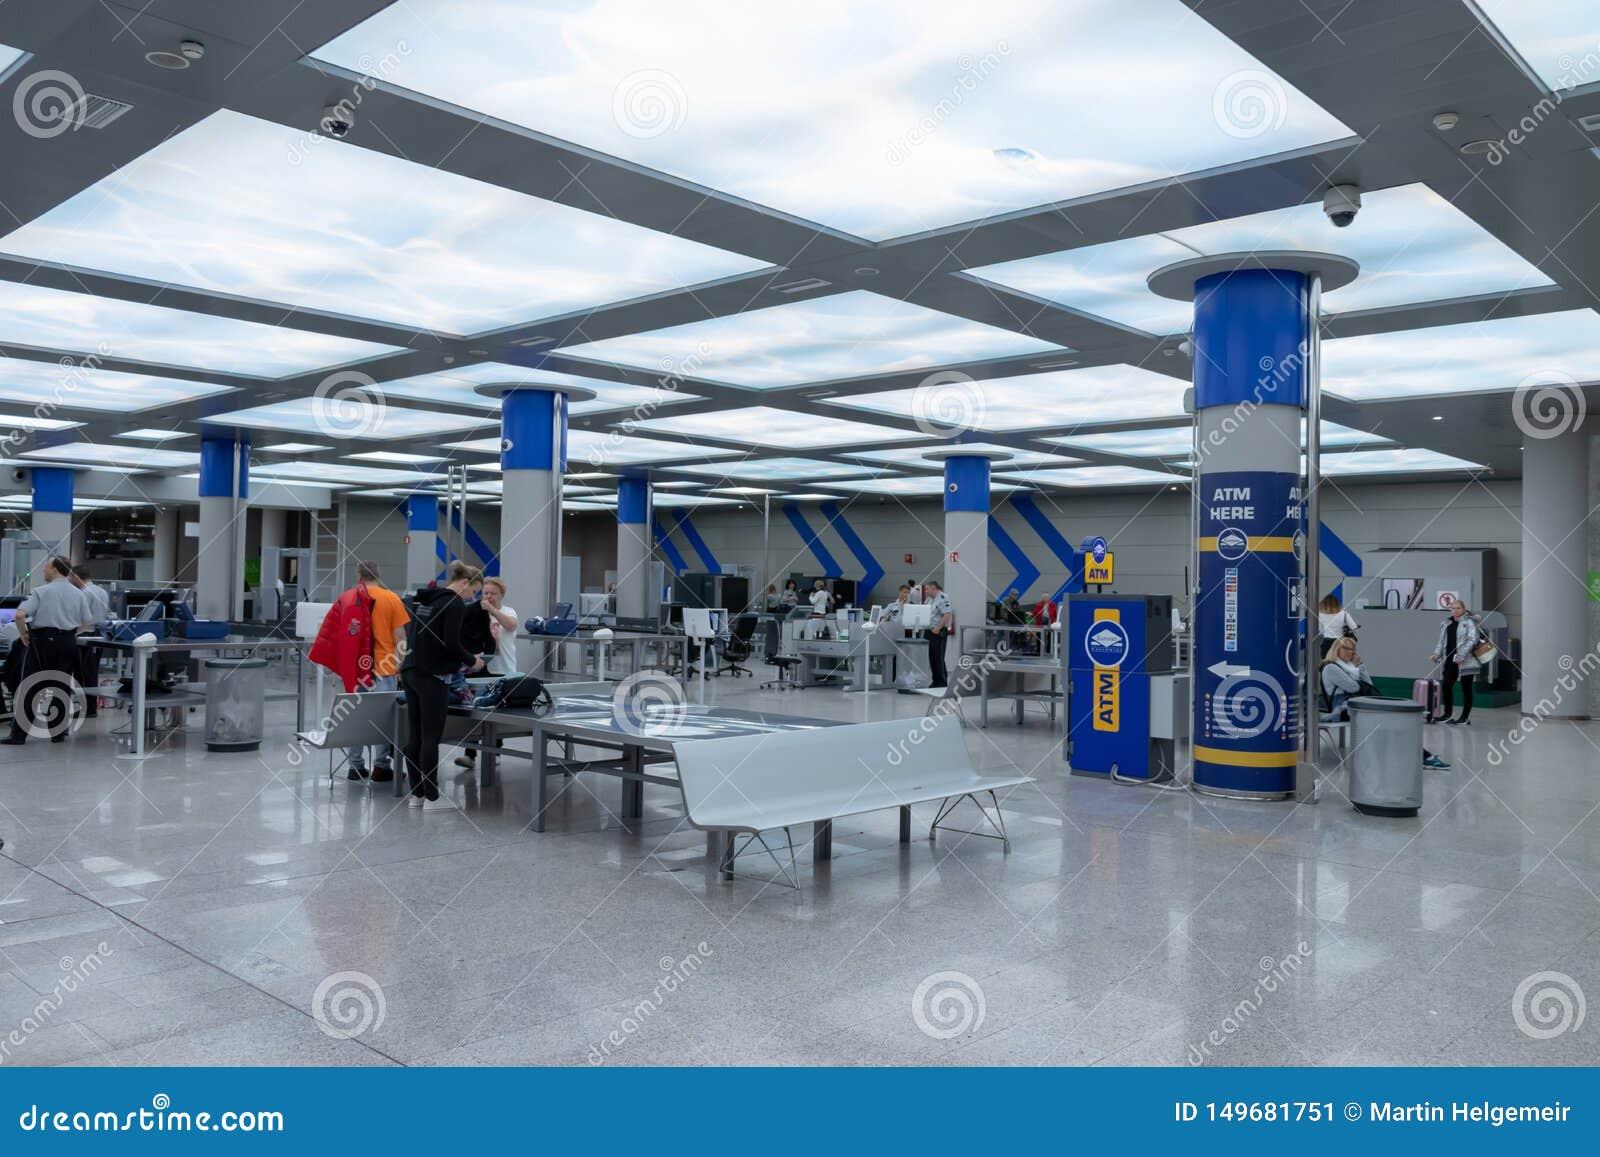 Aéroport, palma, Majorque, Espagne, 14 avril 2019 : contrôle de sécurité à l aéroport du palma, Majorque